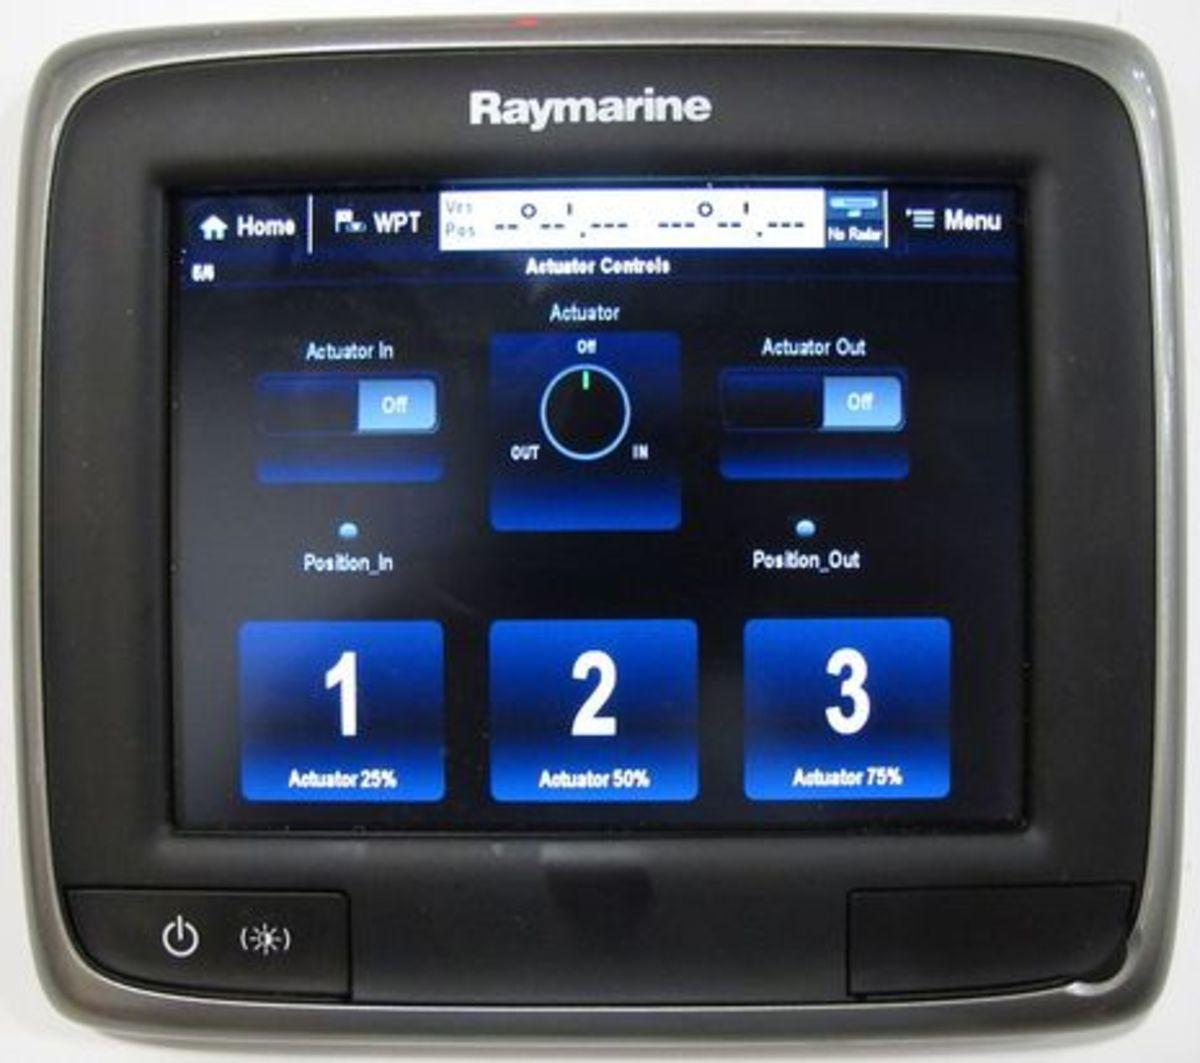 Raymarine_EmpirBus_digital_switching_actuator_example_cPanbo.jpg